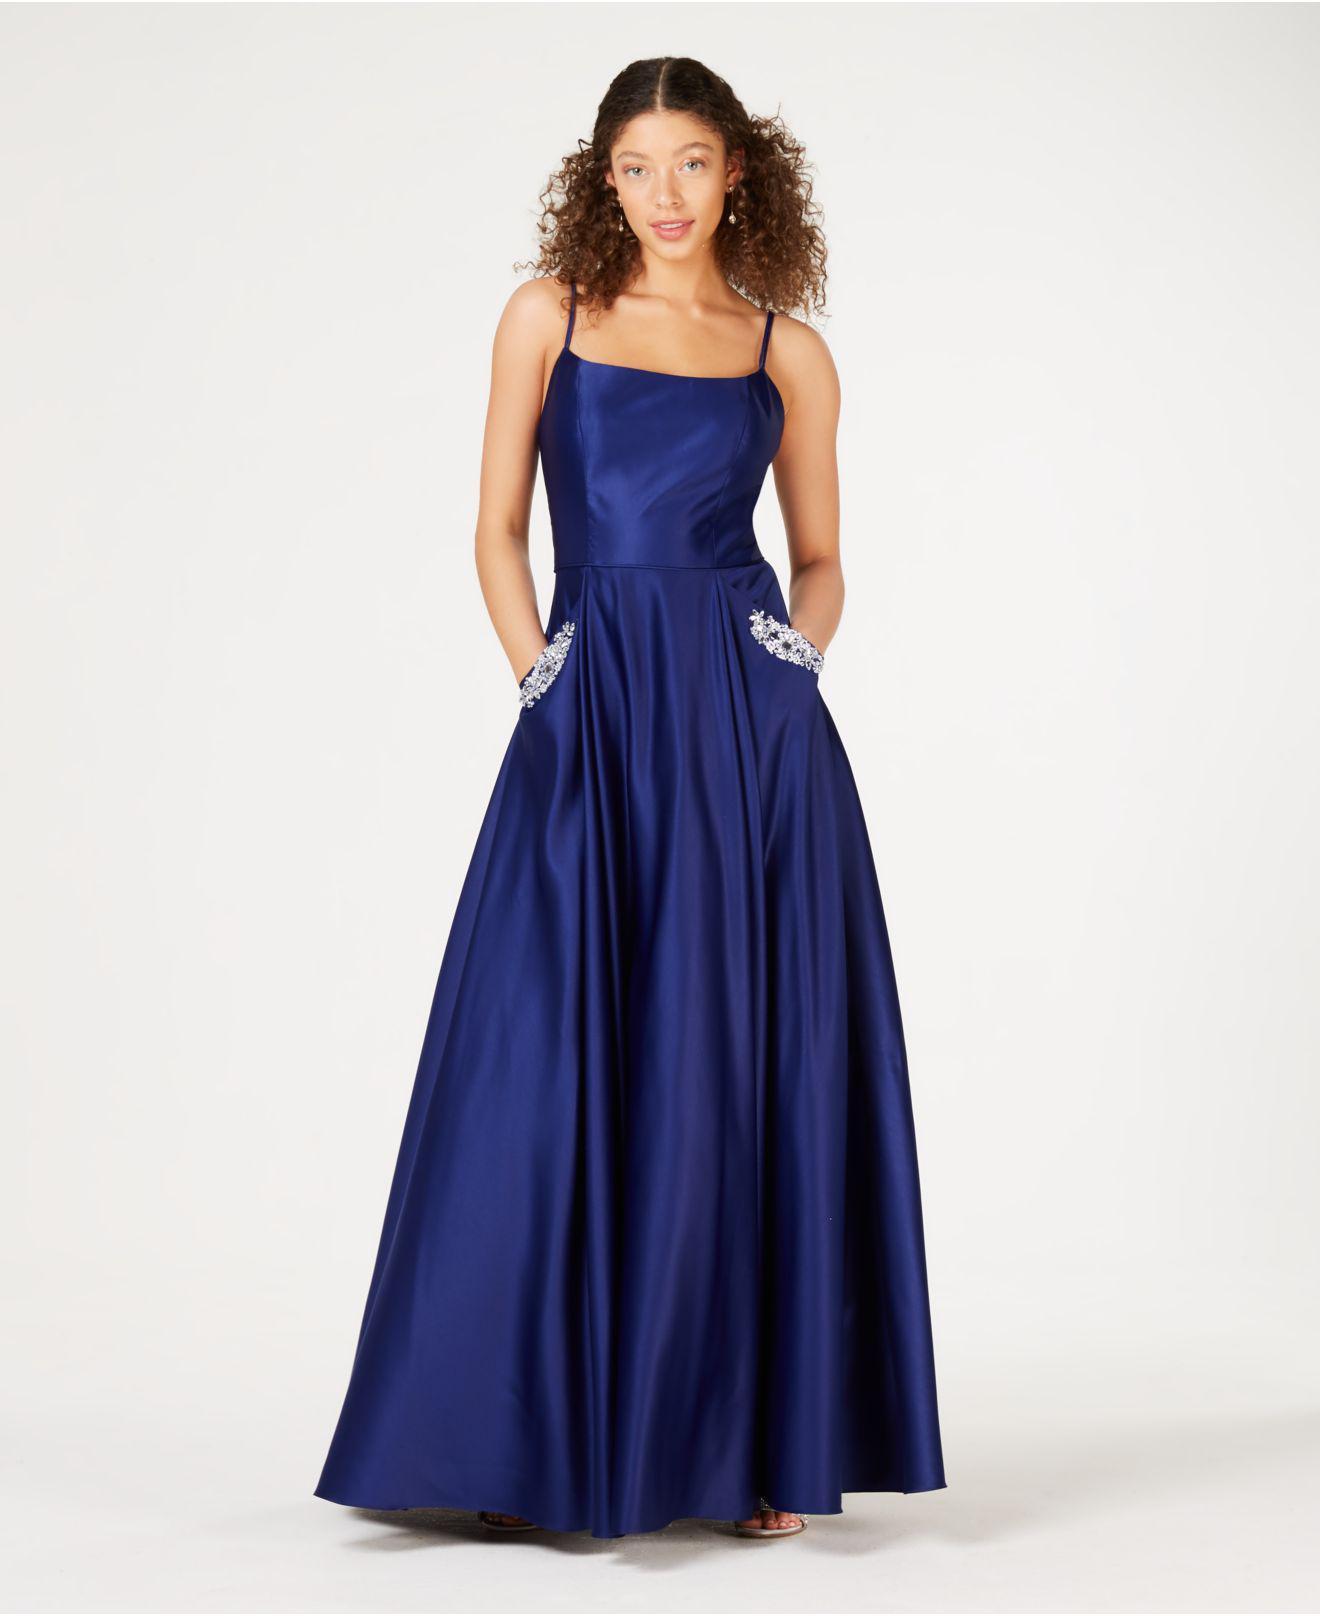 3da76fef9b54d Blondie Nites Juniors' Embellished Satin Gown in Blue - Lyst